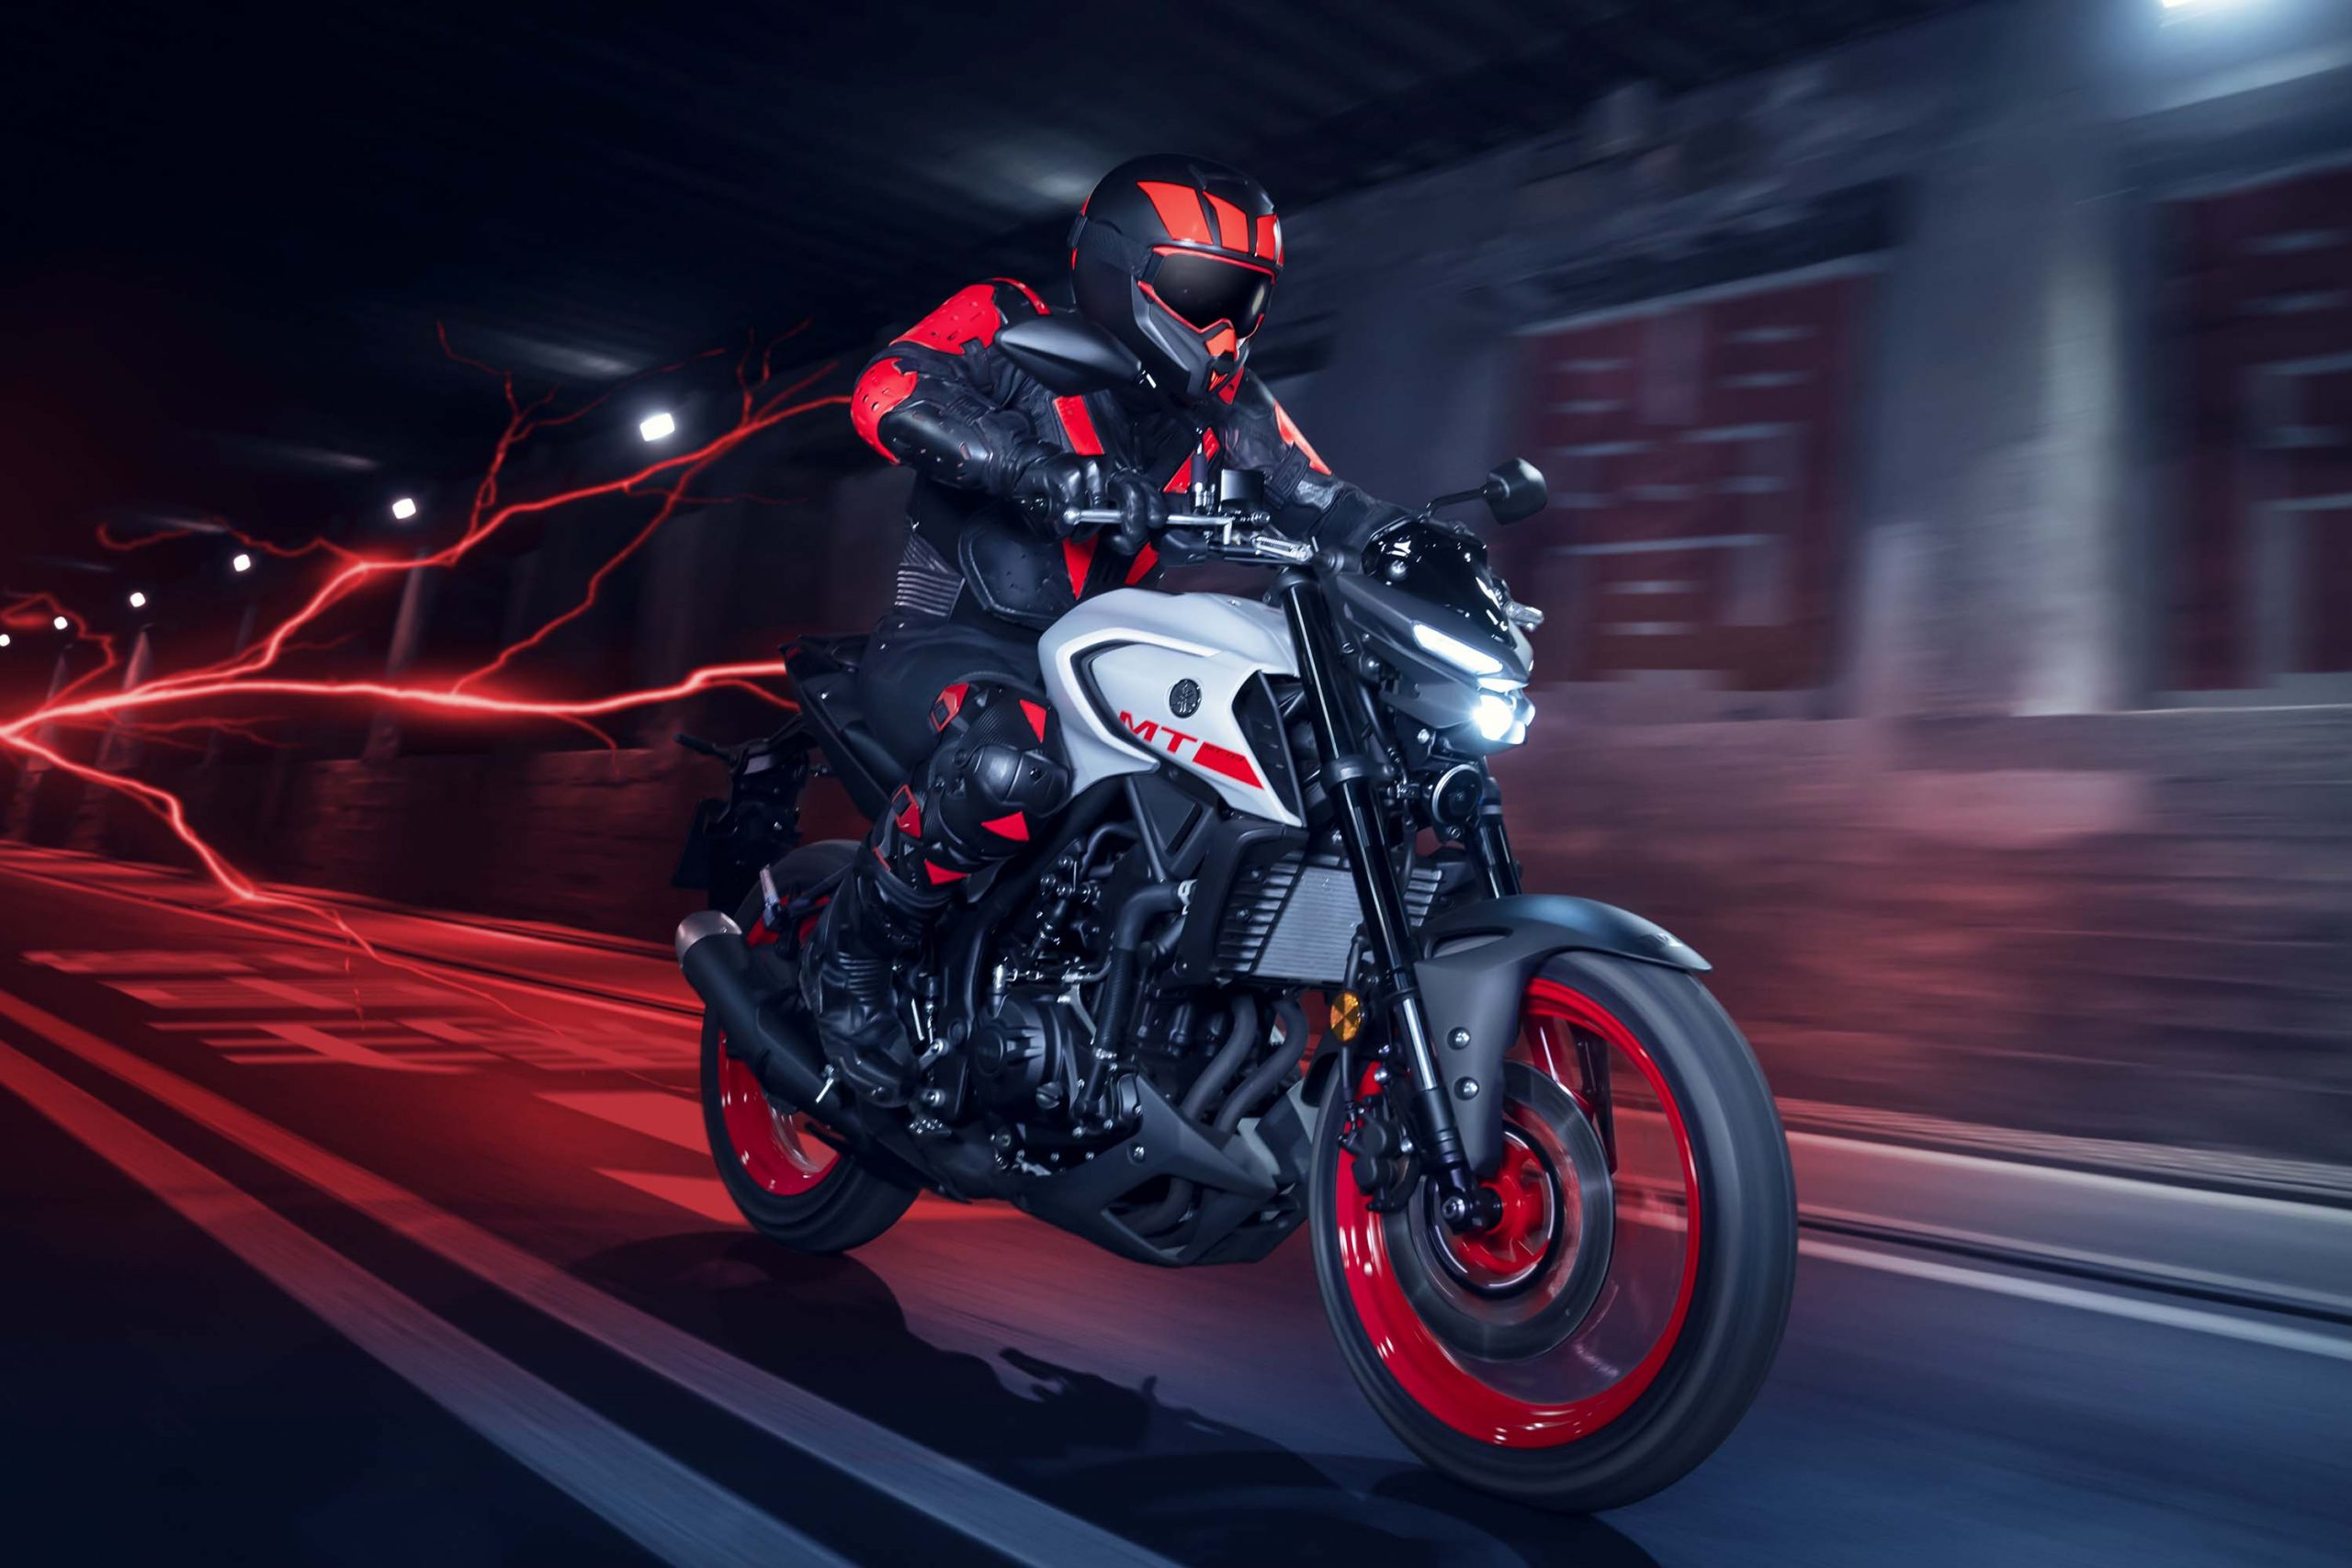 Ny Yamaha MT-03 - Midnight Black 2020 til salg - 123mc